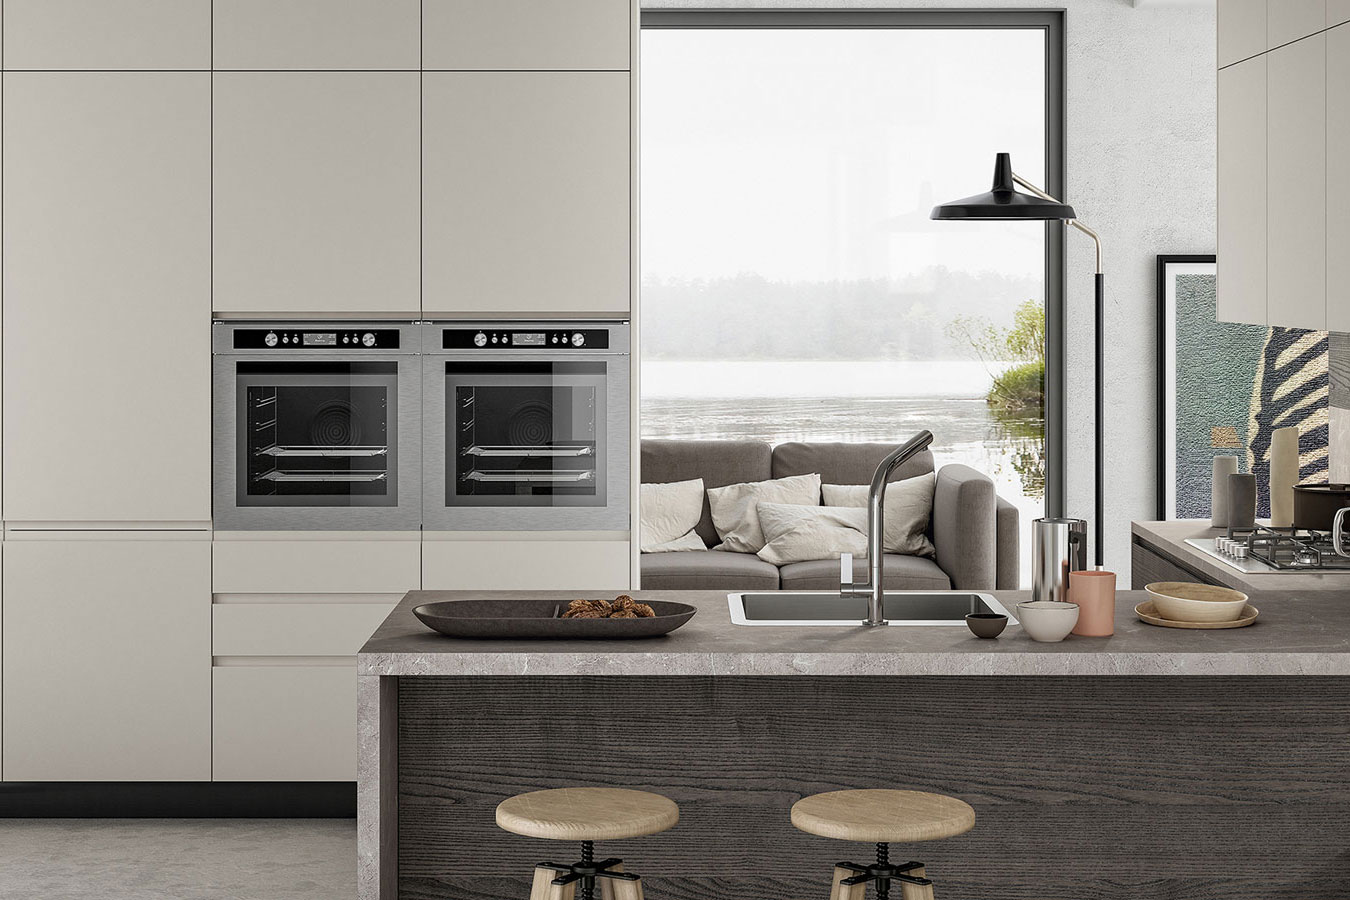 Arredo3-Cucina-Wega-3-moderna-bianca-legno-colonne-due-forni ...